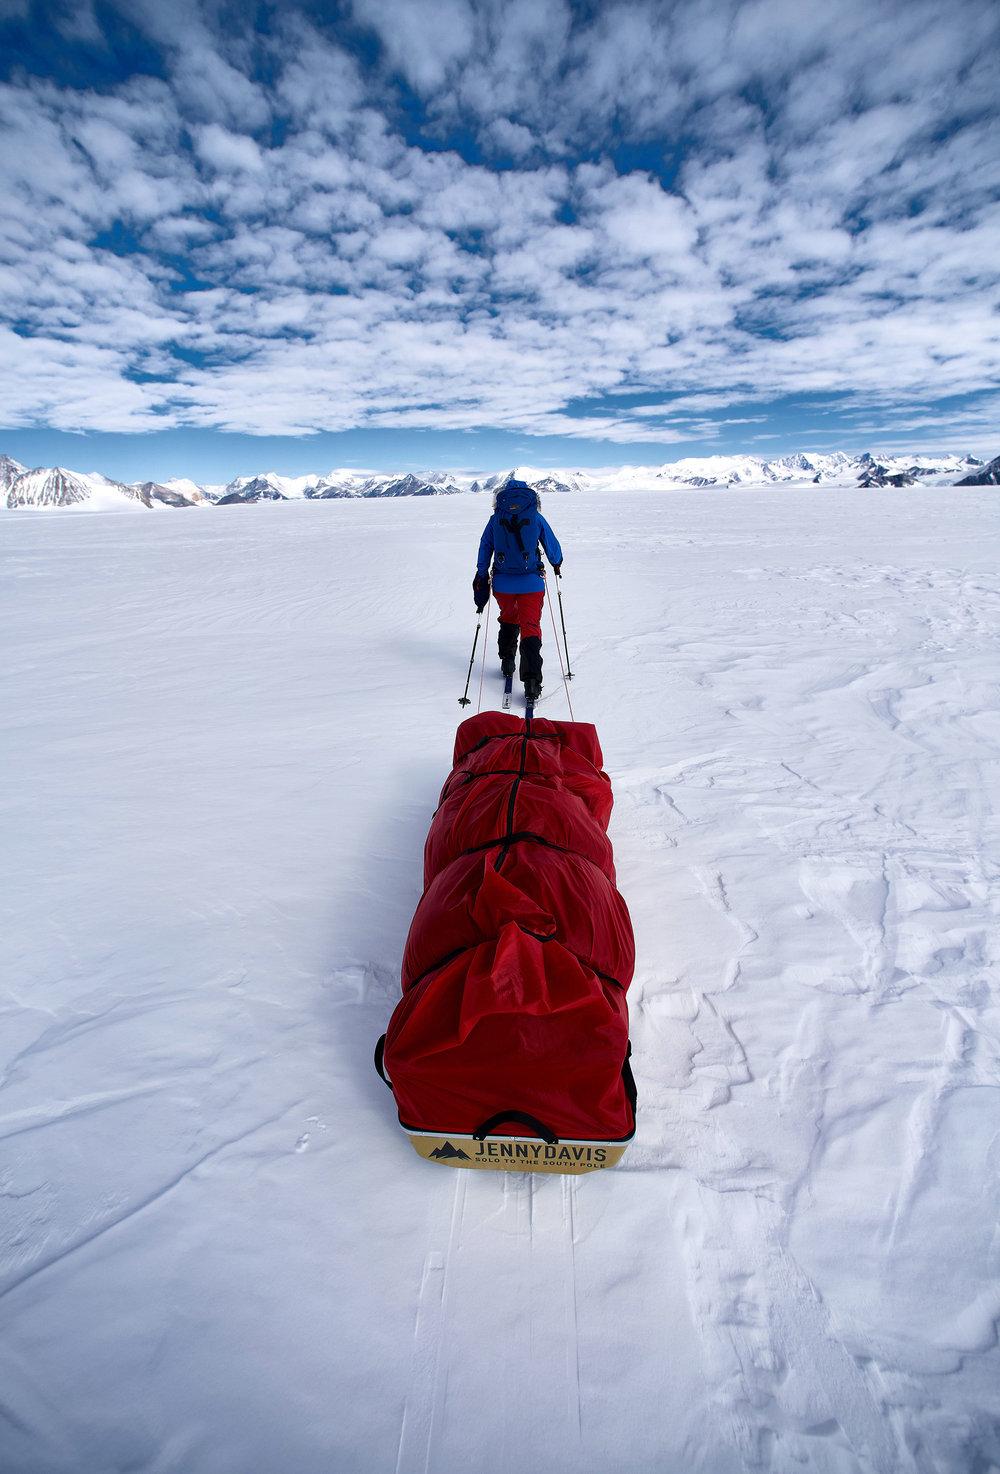 Jenny Davis practising hauling her sled near Union Glacier camp